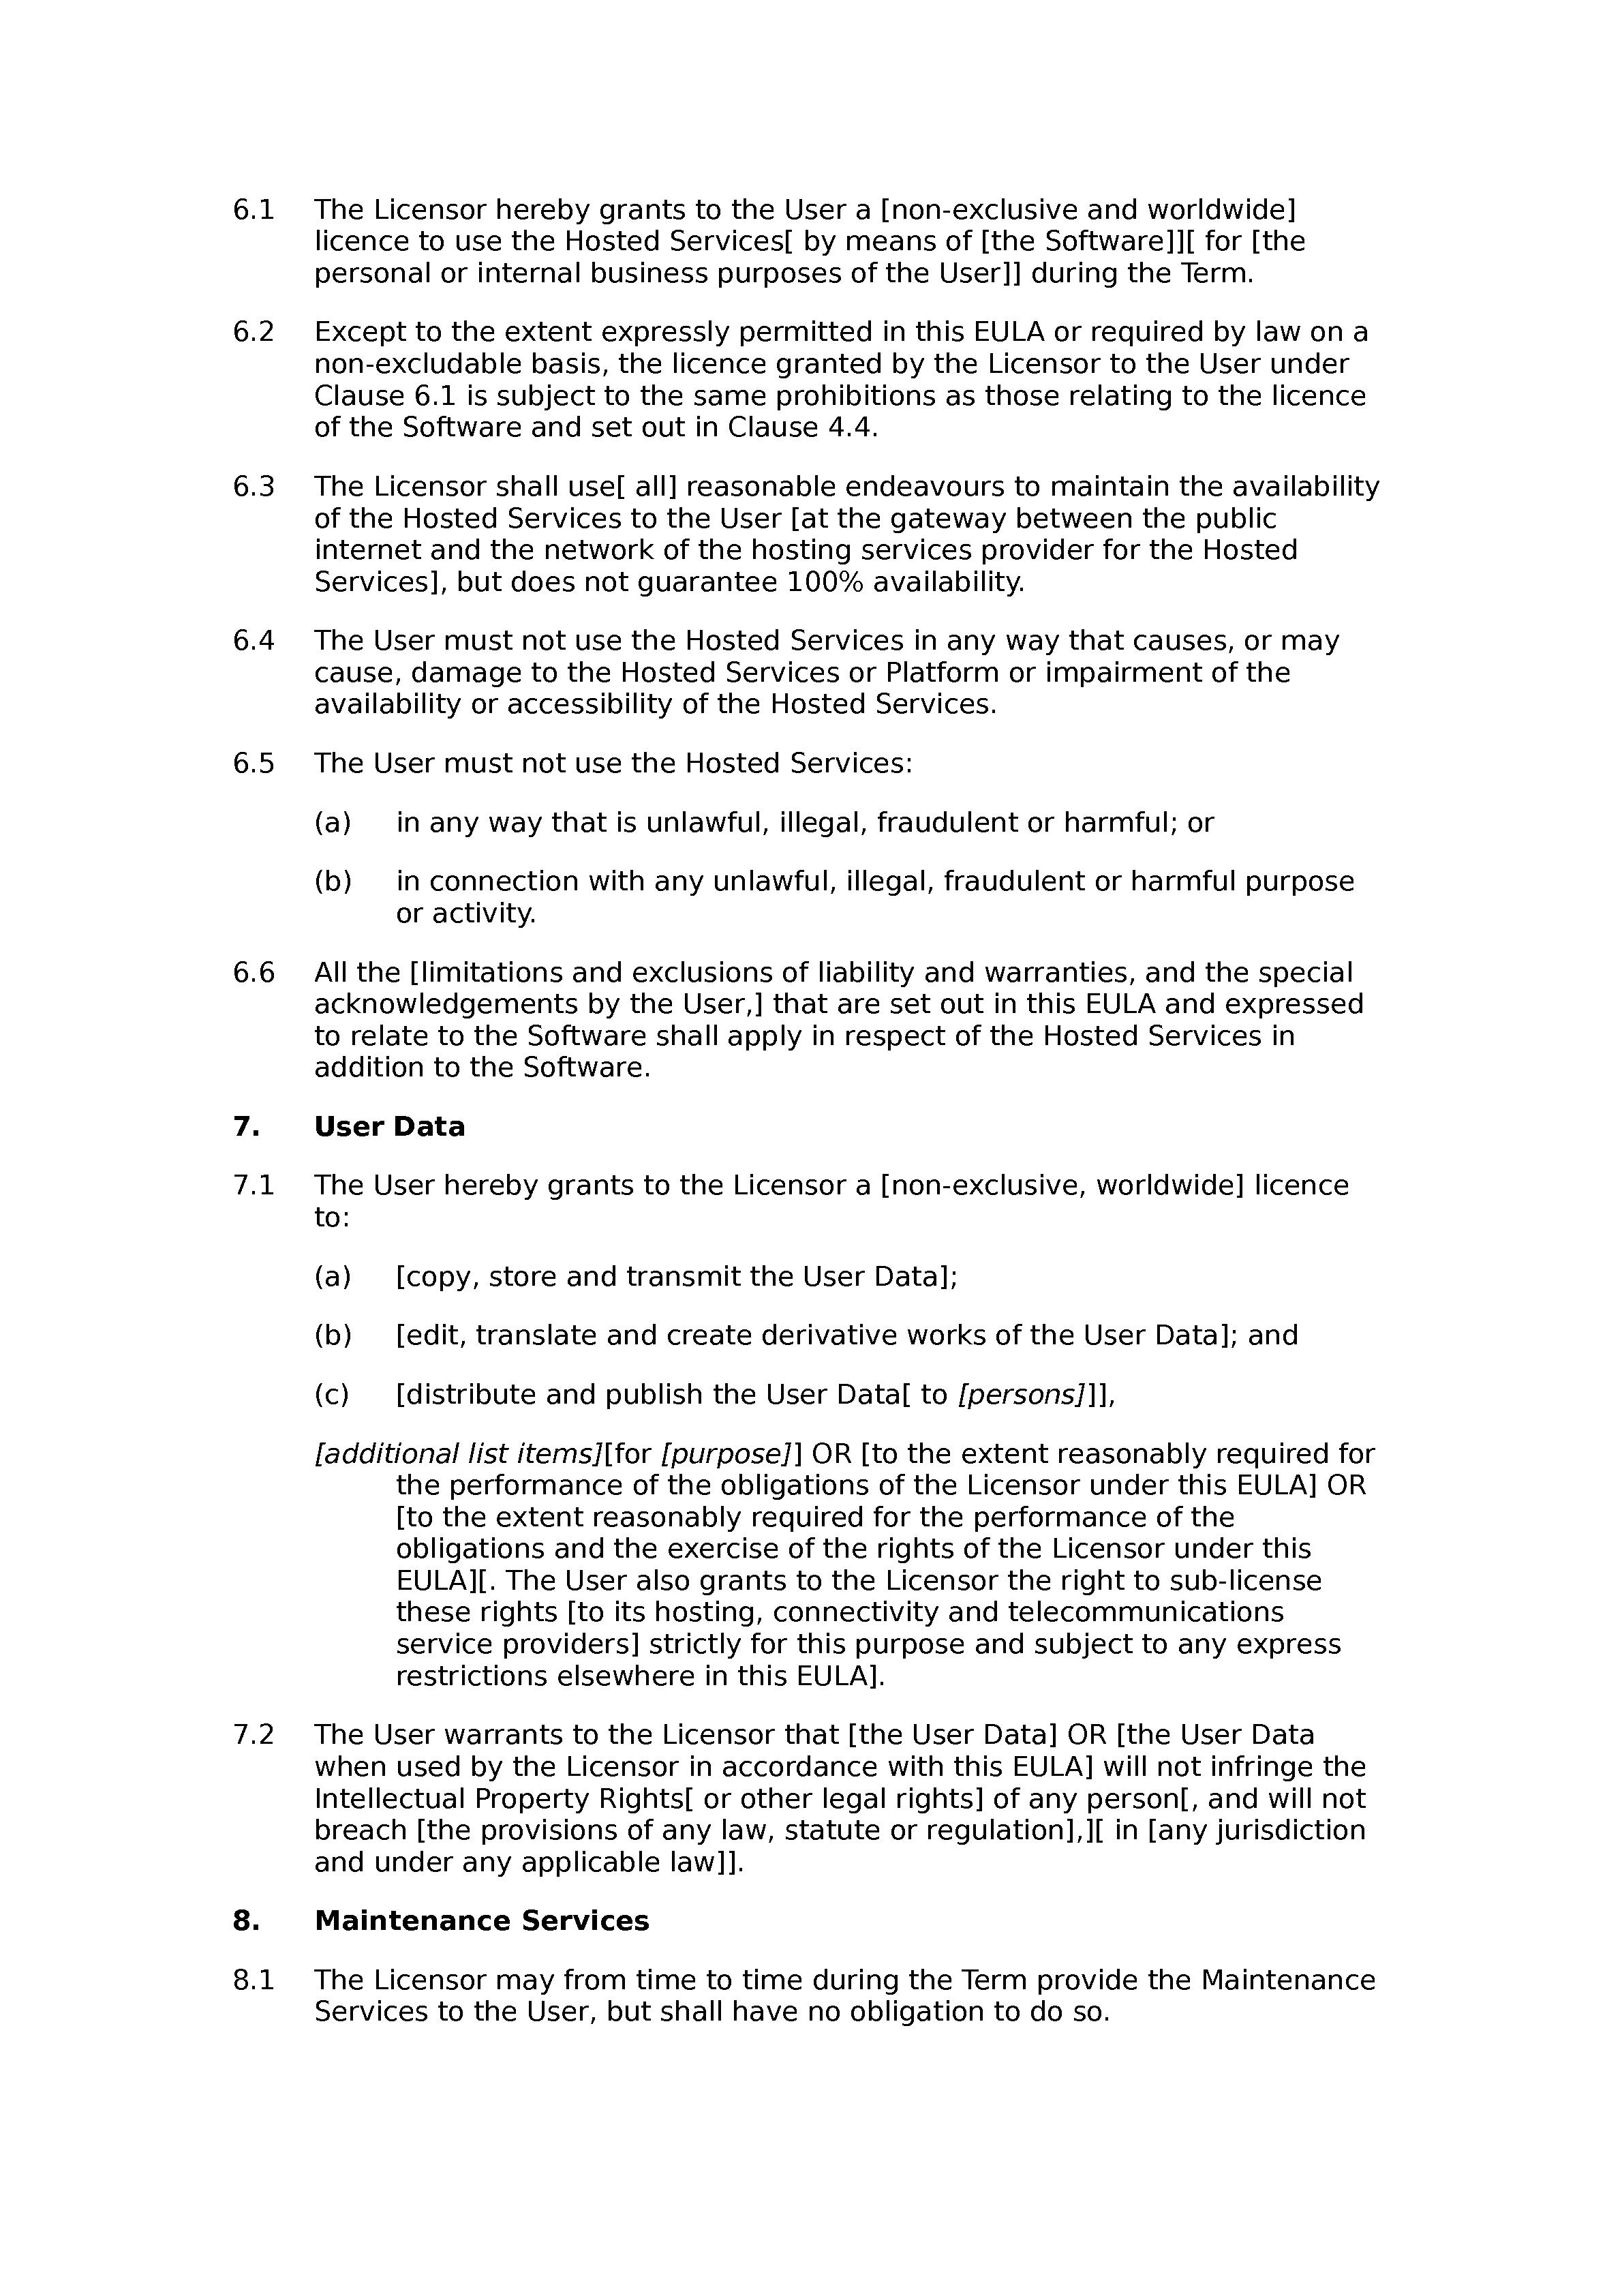 App EULA document preview